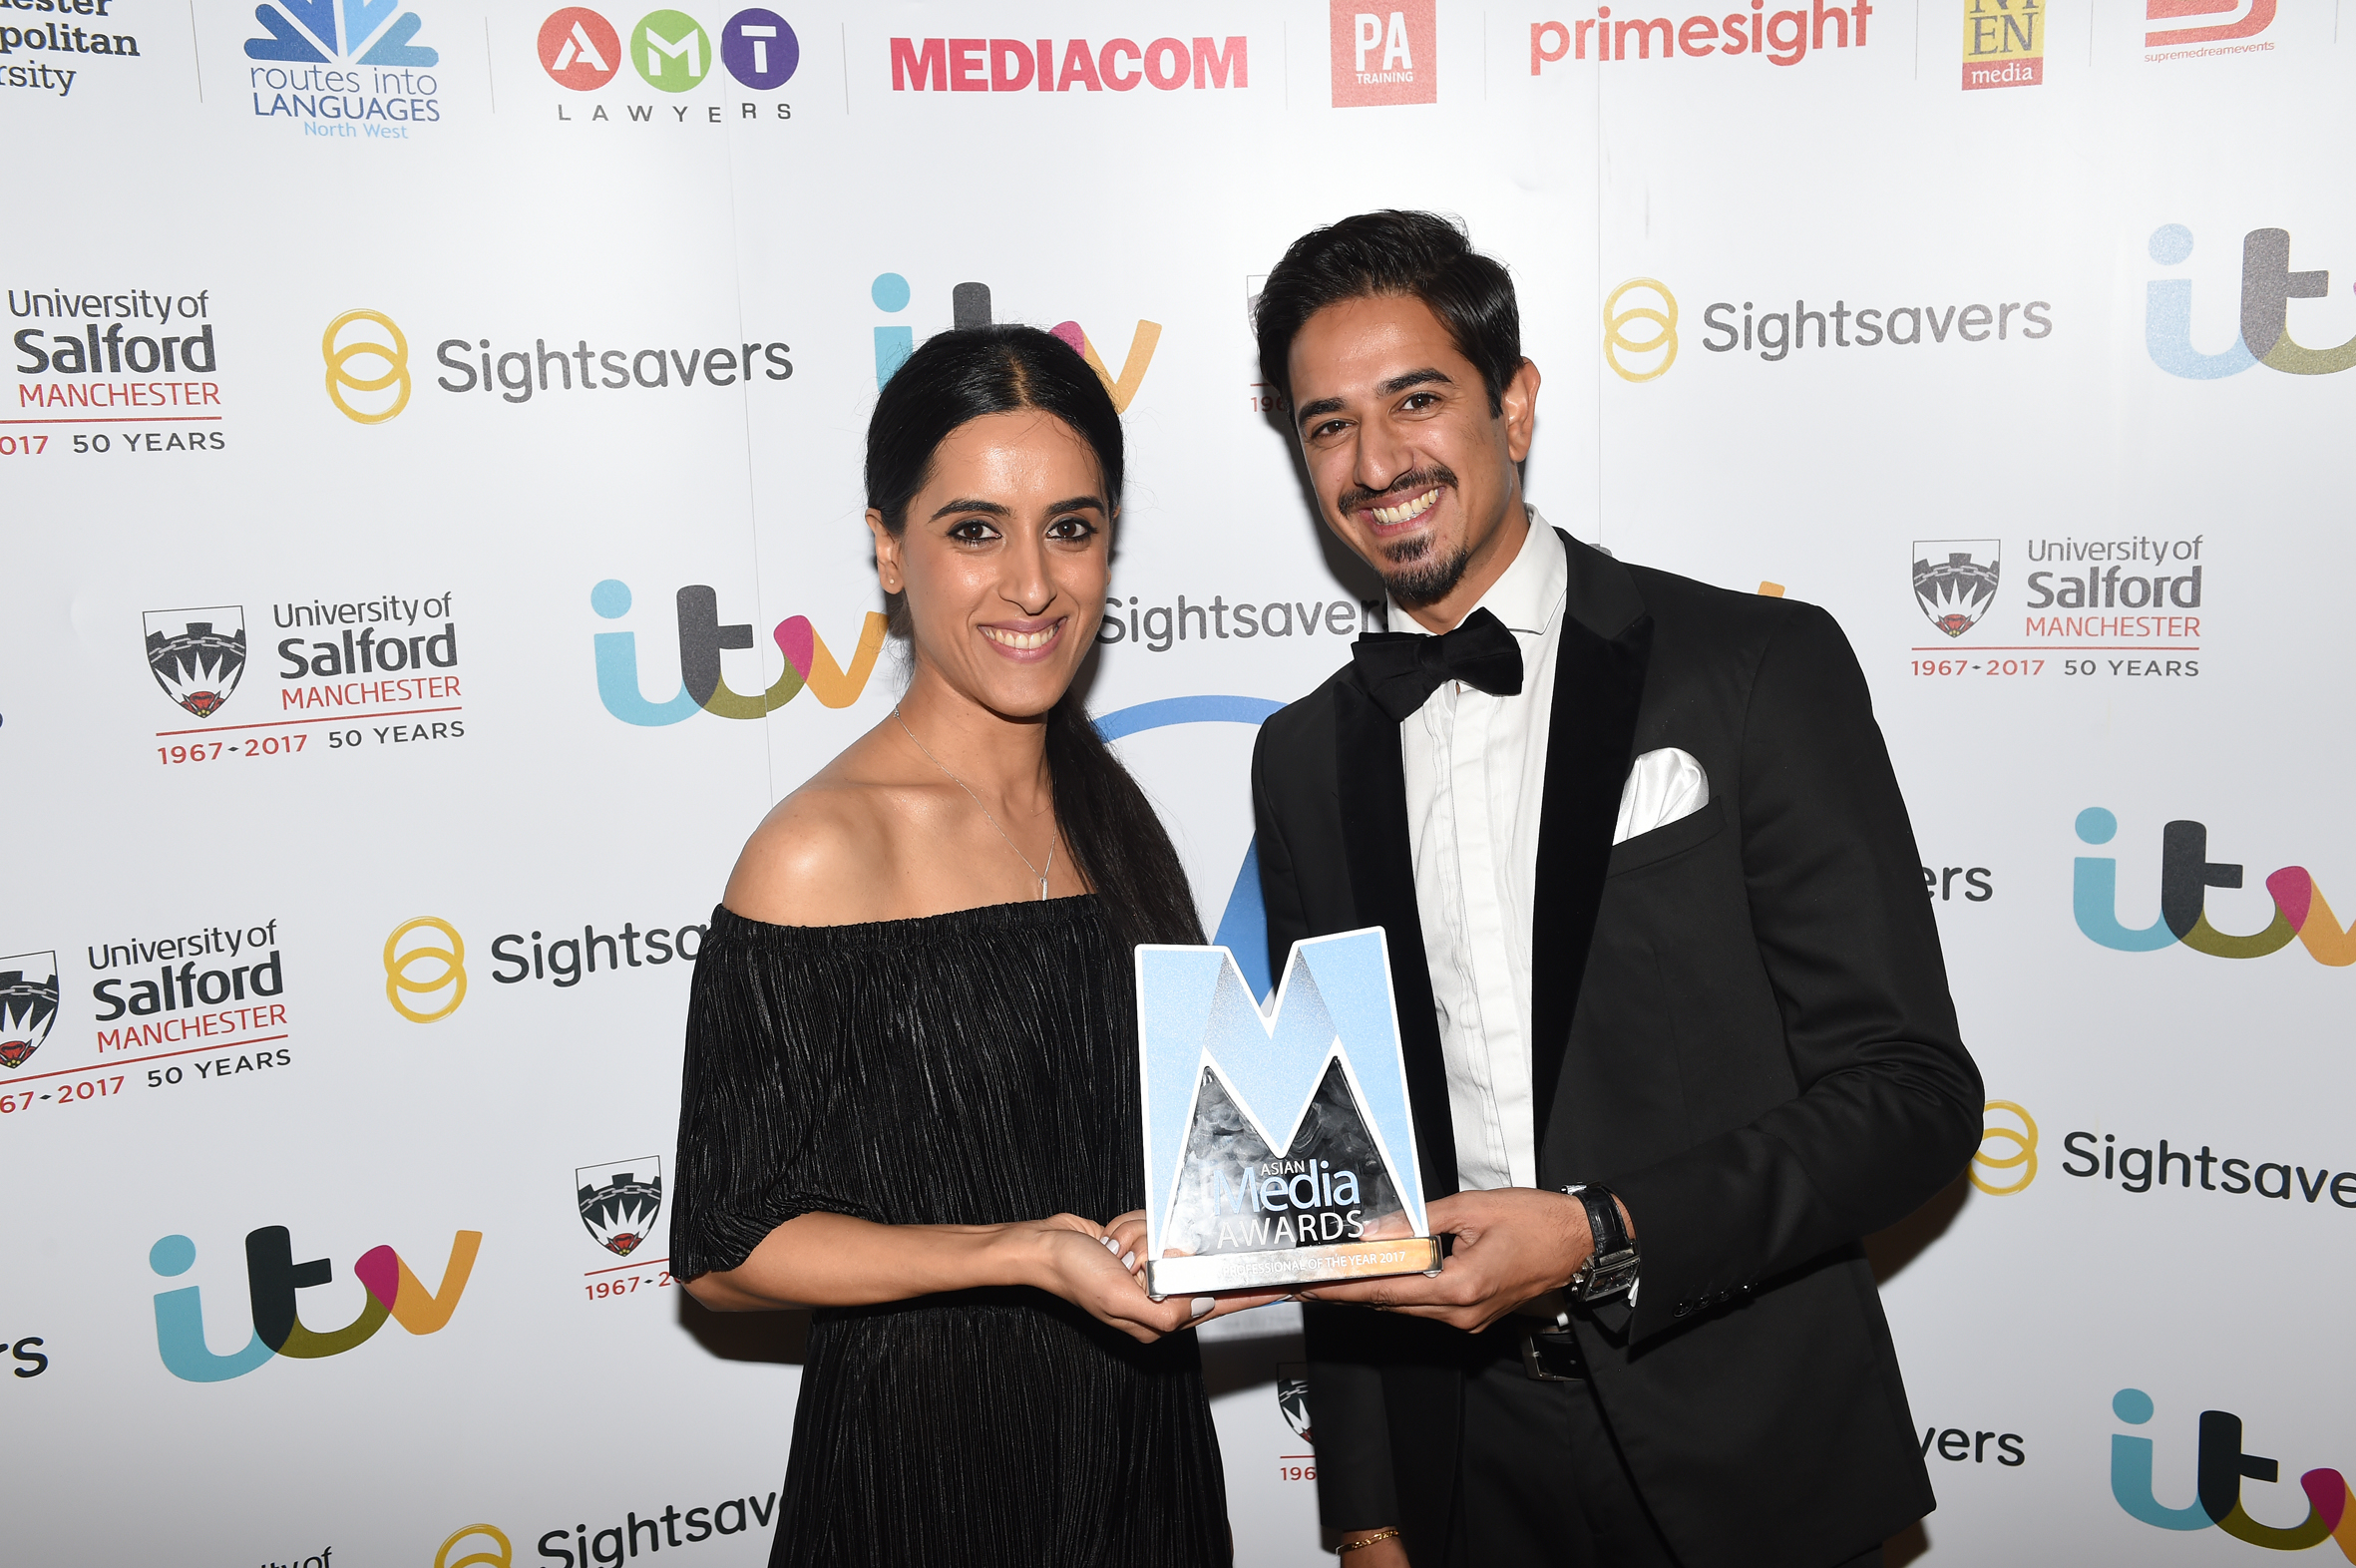 Arika Murtza is Media Professional of the Year